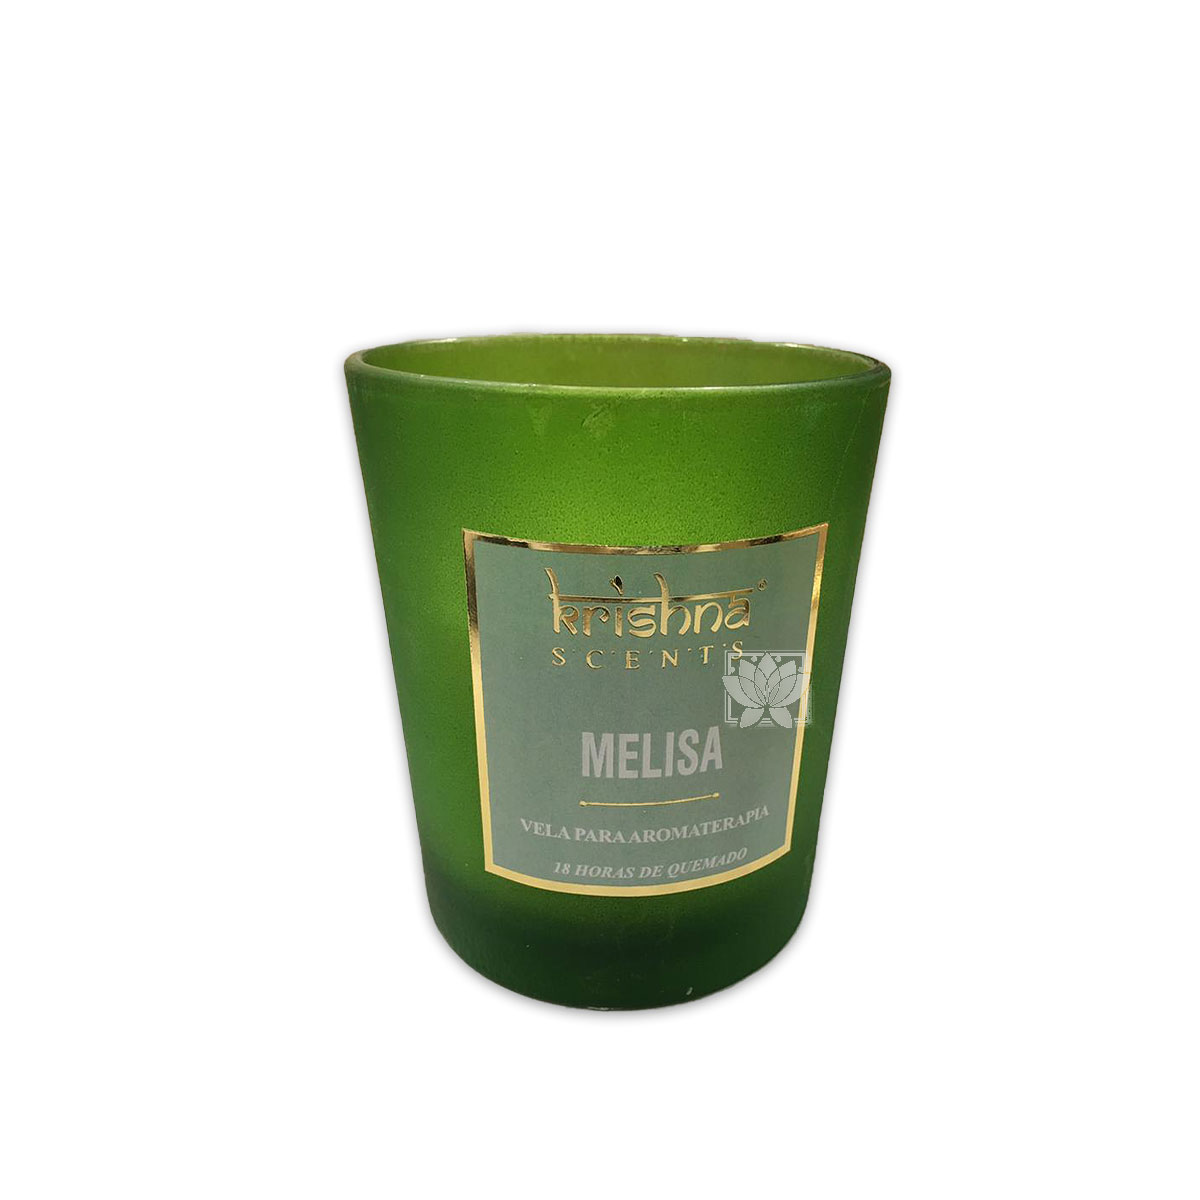 Vela Aromaticas Krishna  Melisa  KS-201